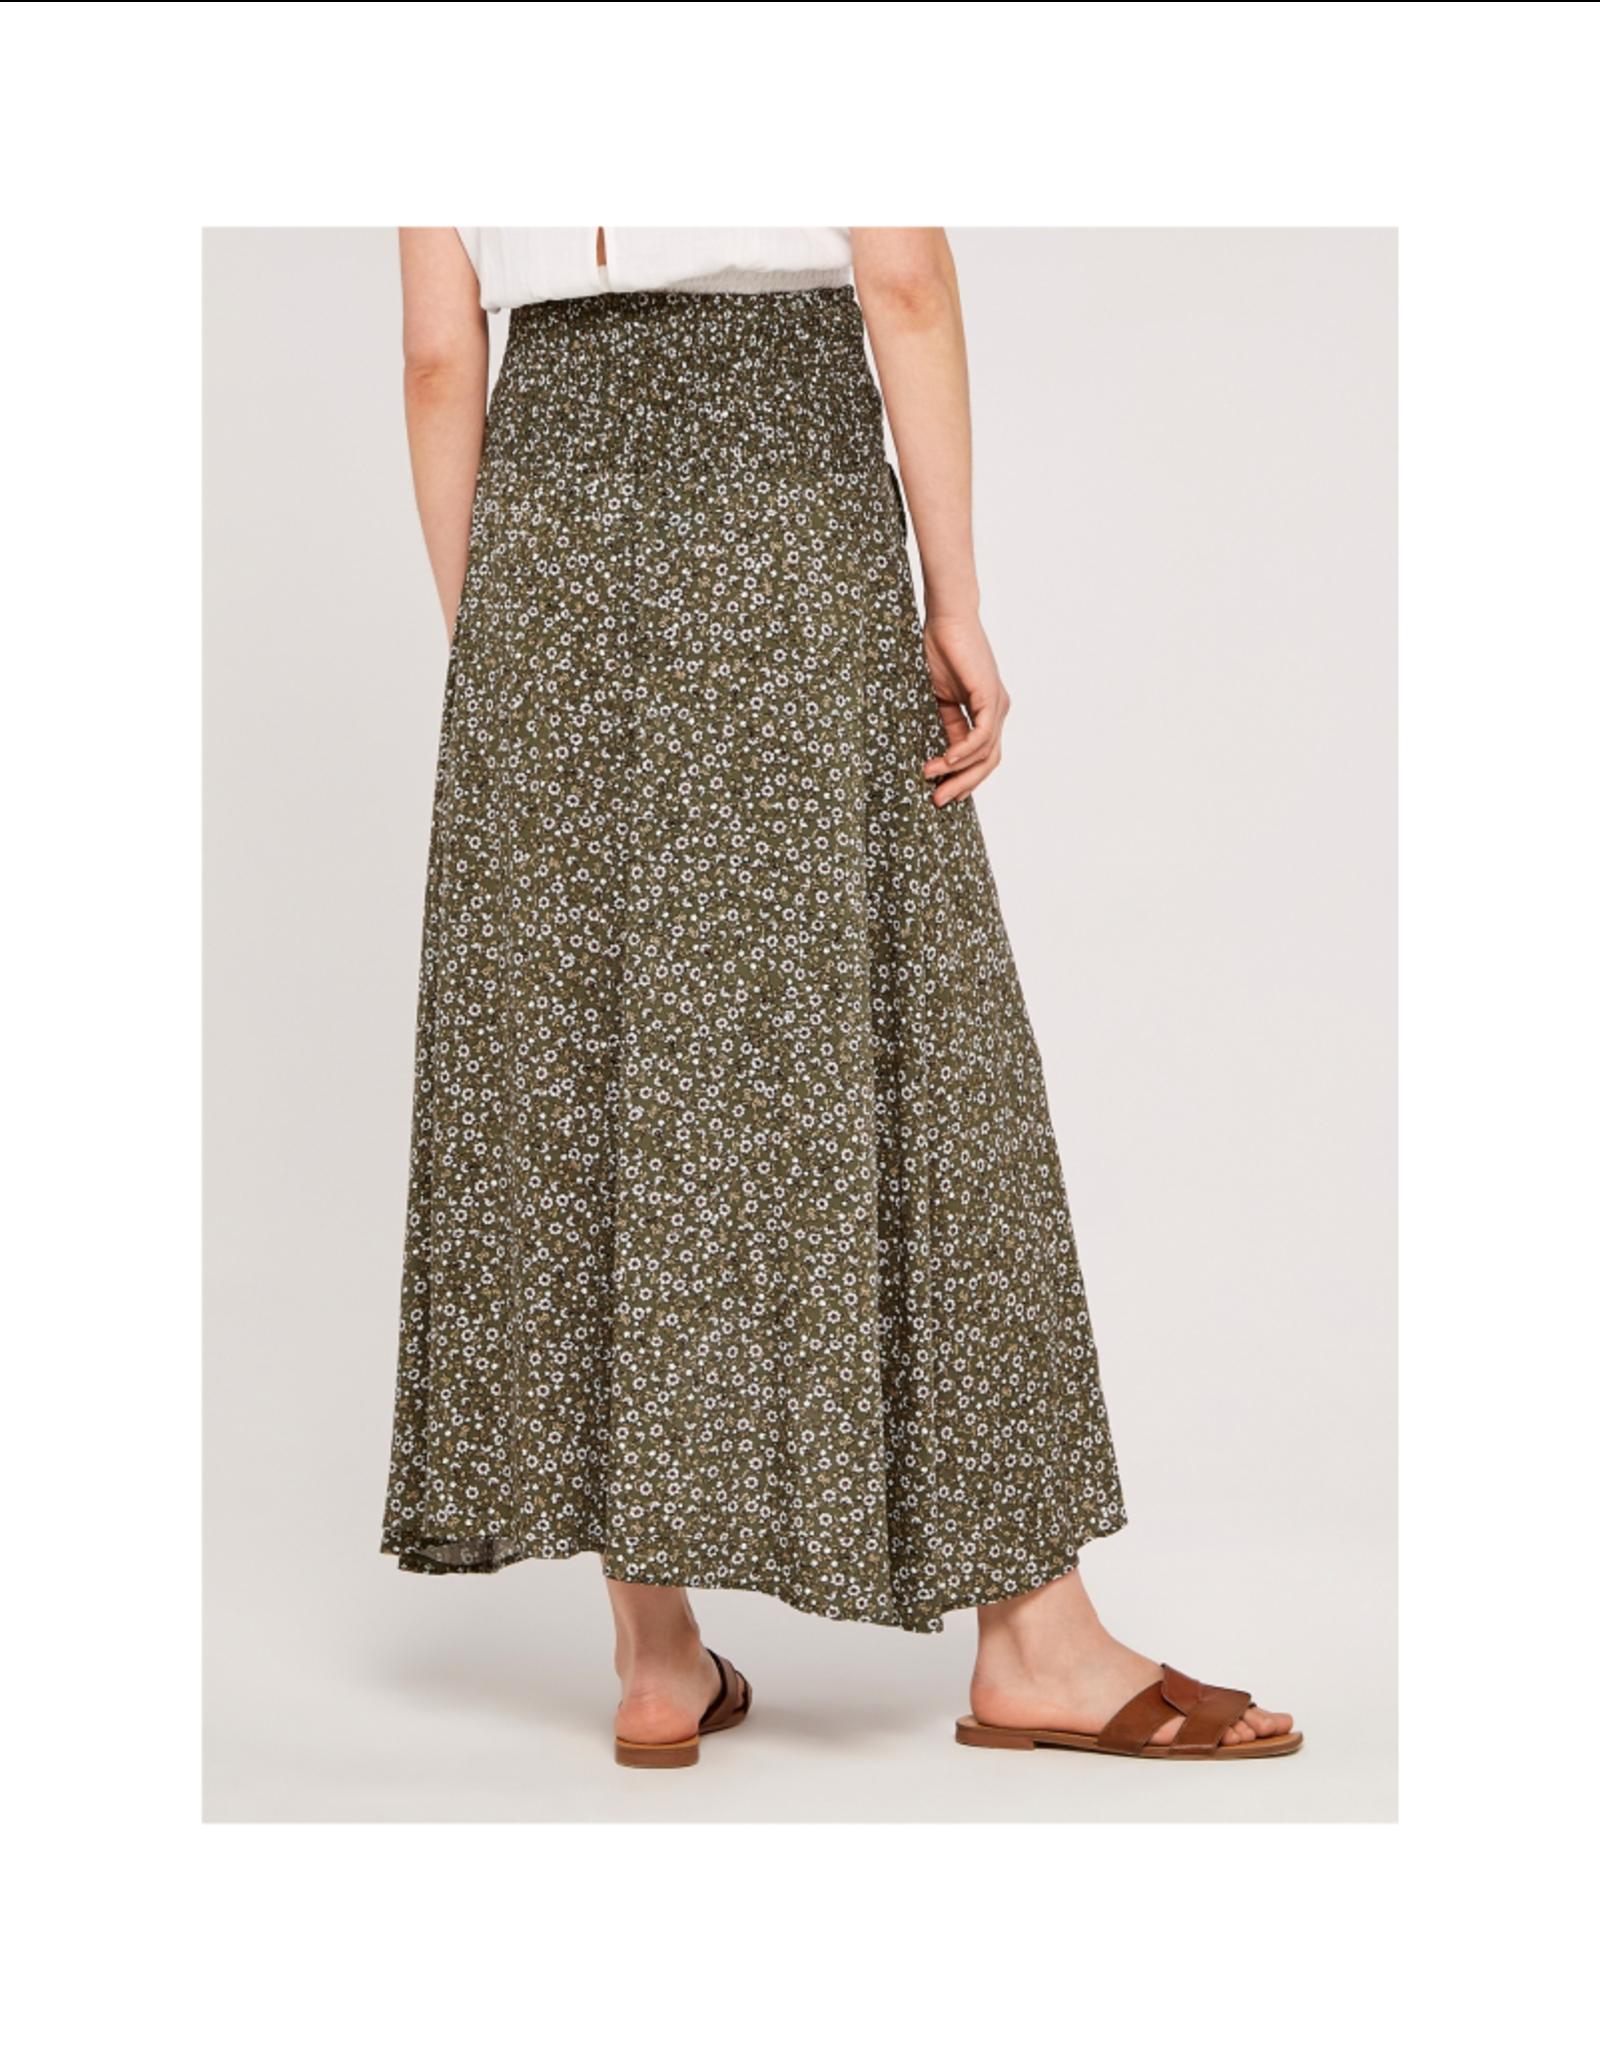 Apricot Smocked Waist Wrap Skirt